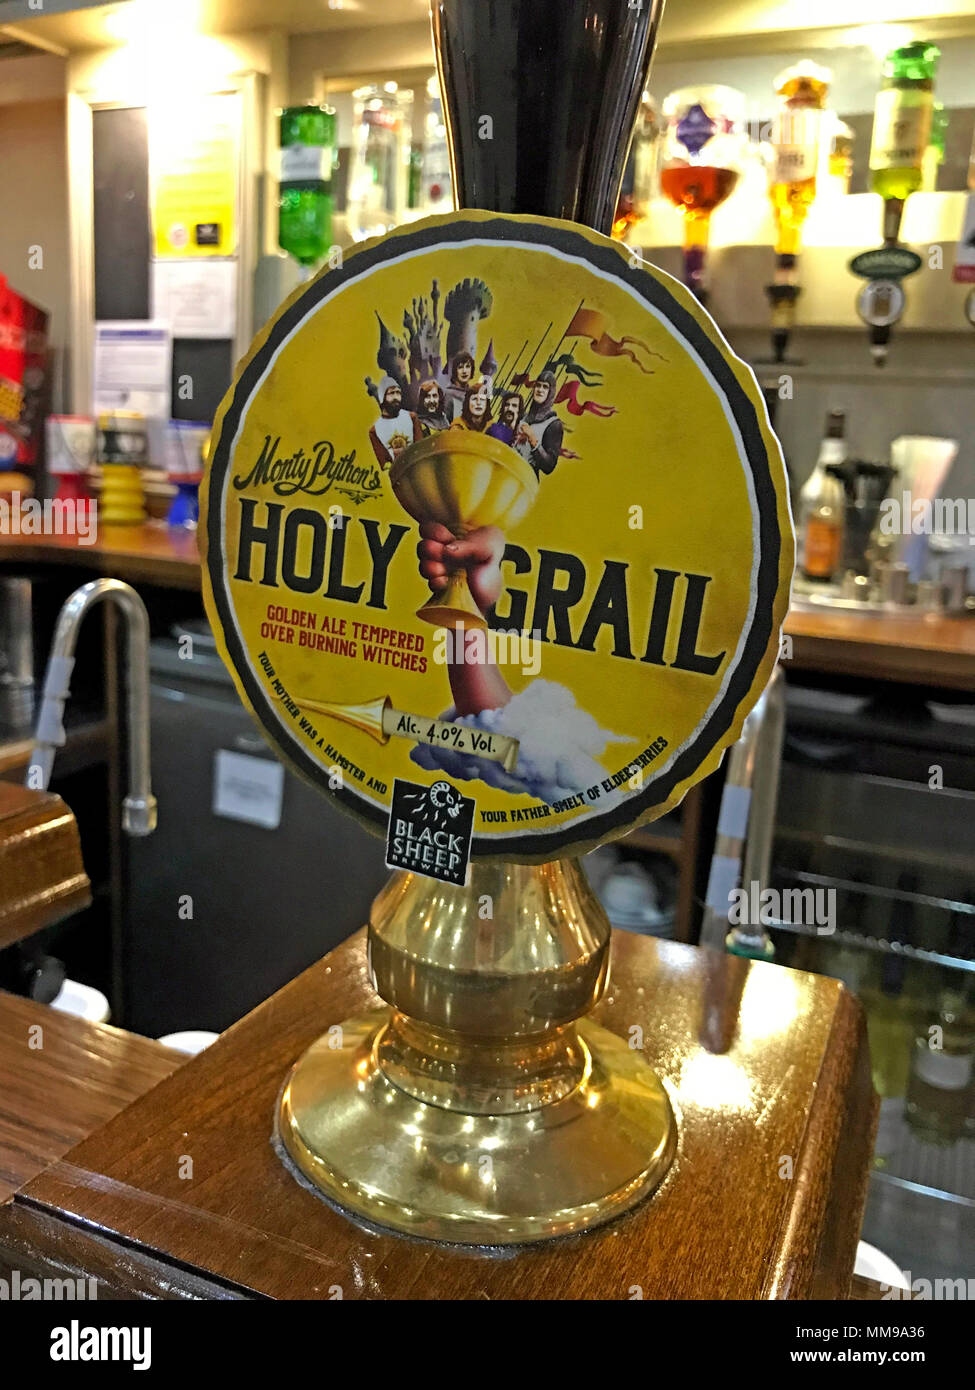 GoTonysmith,@HotpixUK,beer,pump,on,a,bar,England,GB,UK,craft,craft ale